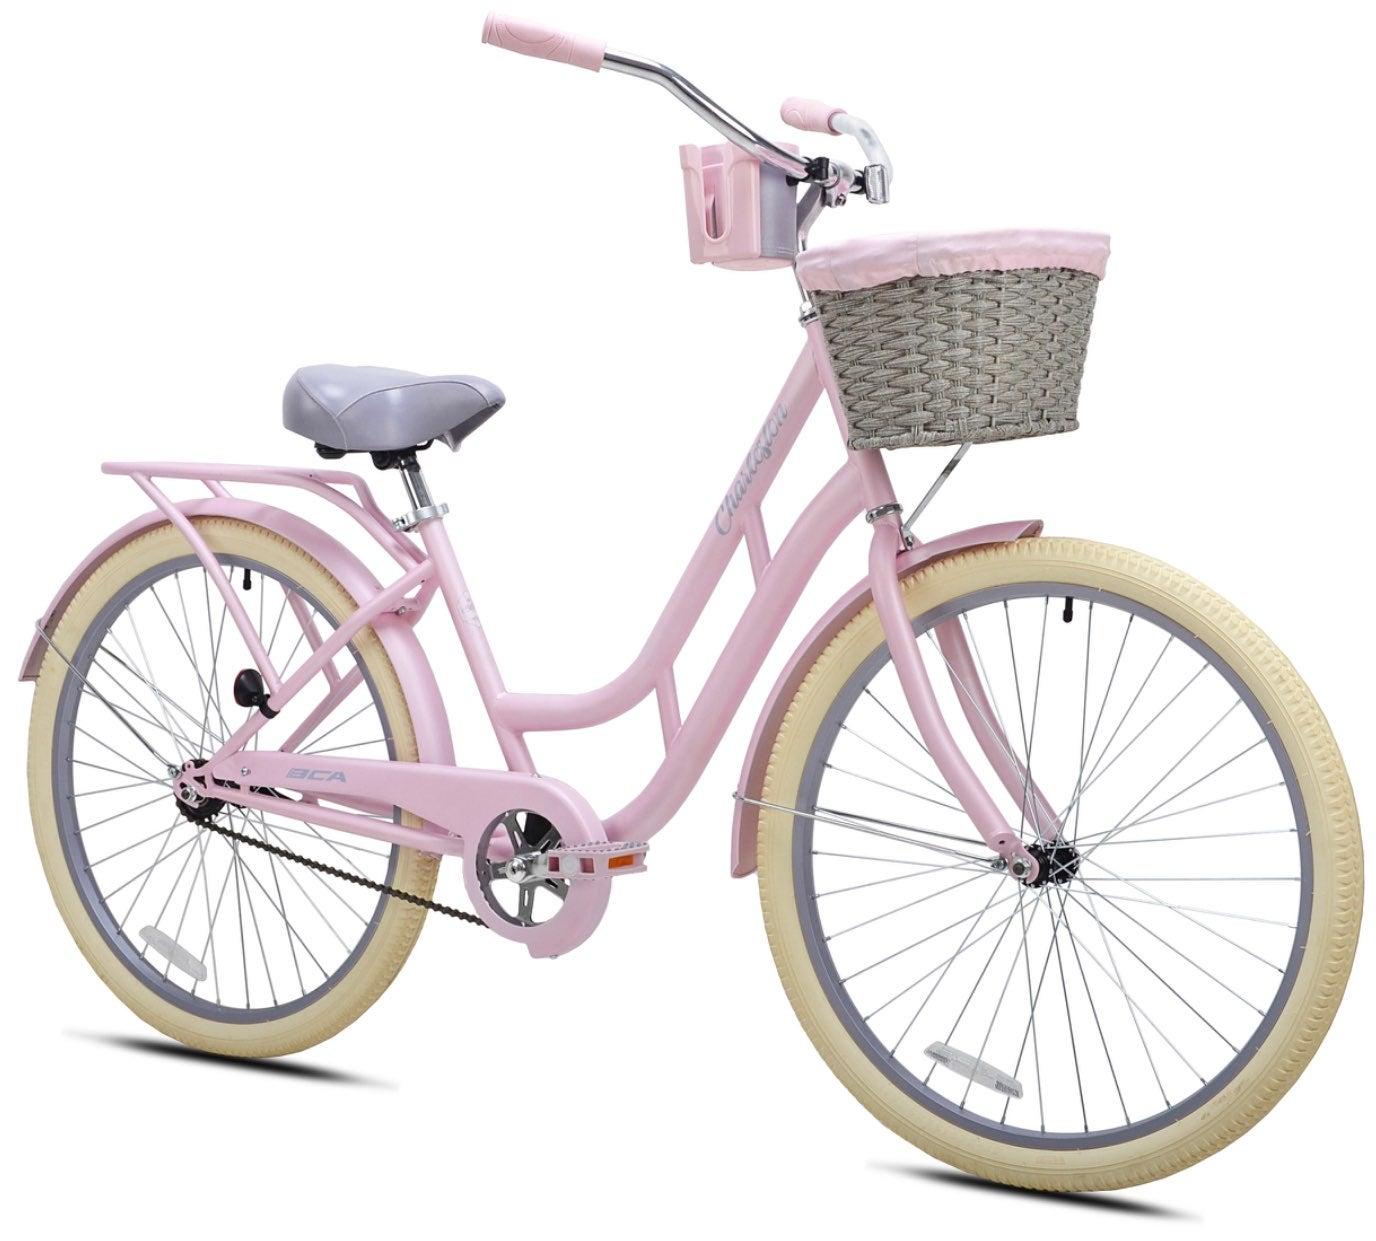 BCA 26 Inch Women's Bike